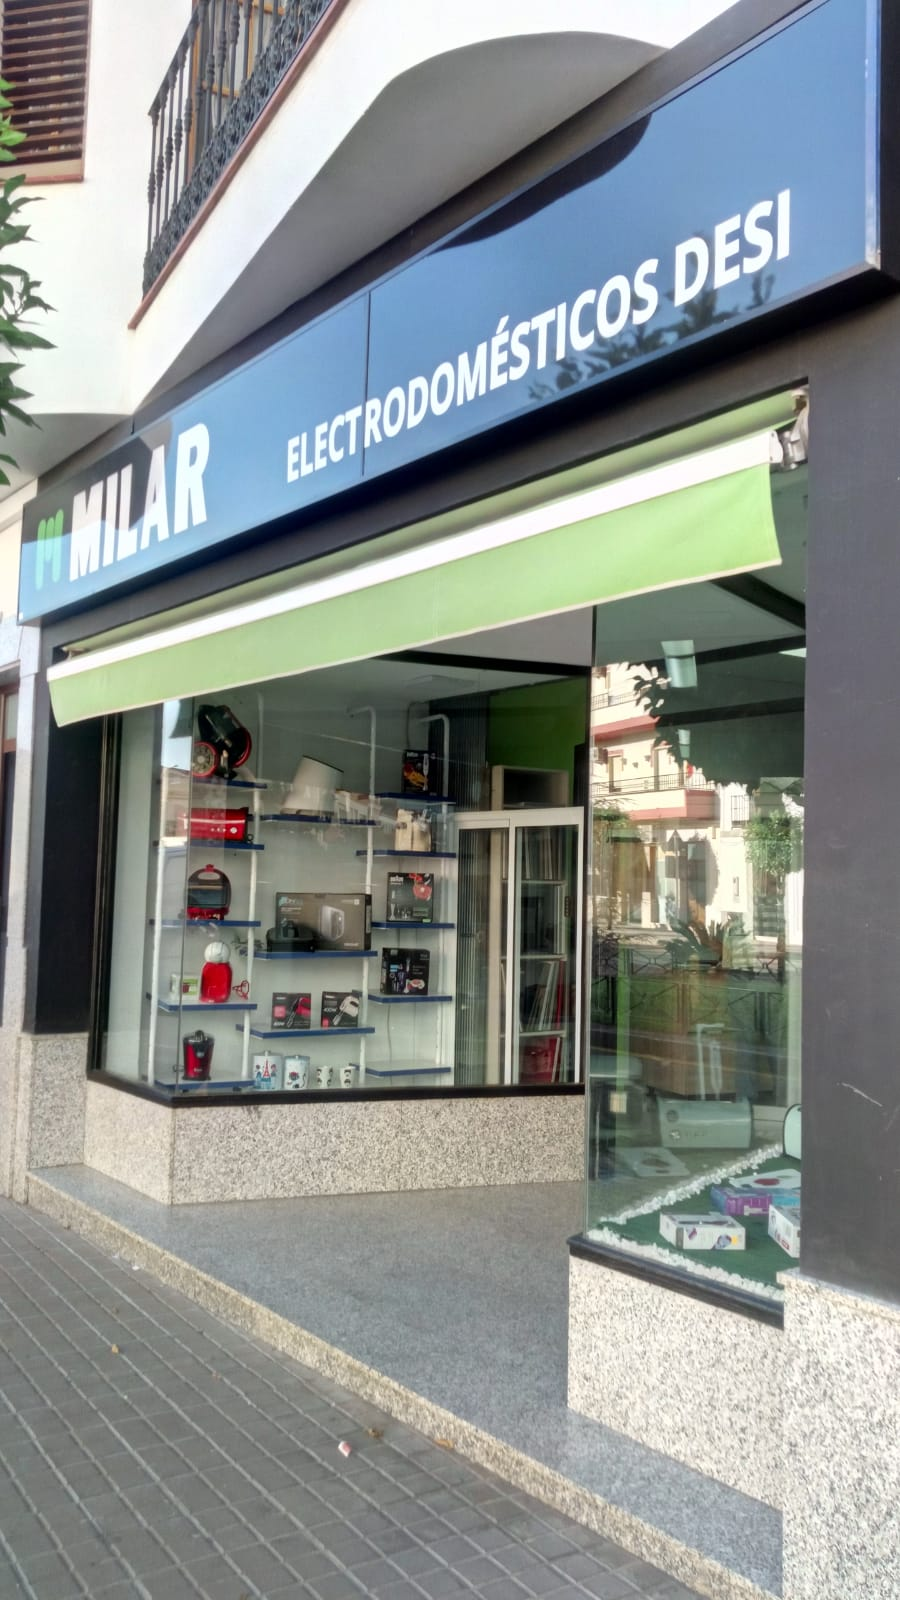 ELECTRODOMÉSTICOS COCINAS ACEUCHAL DESI